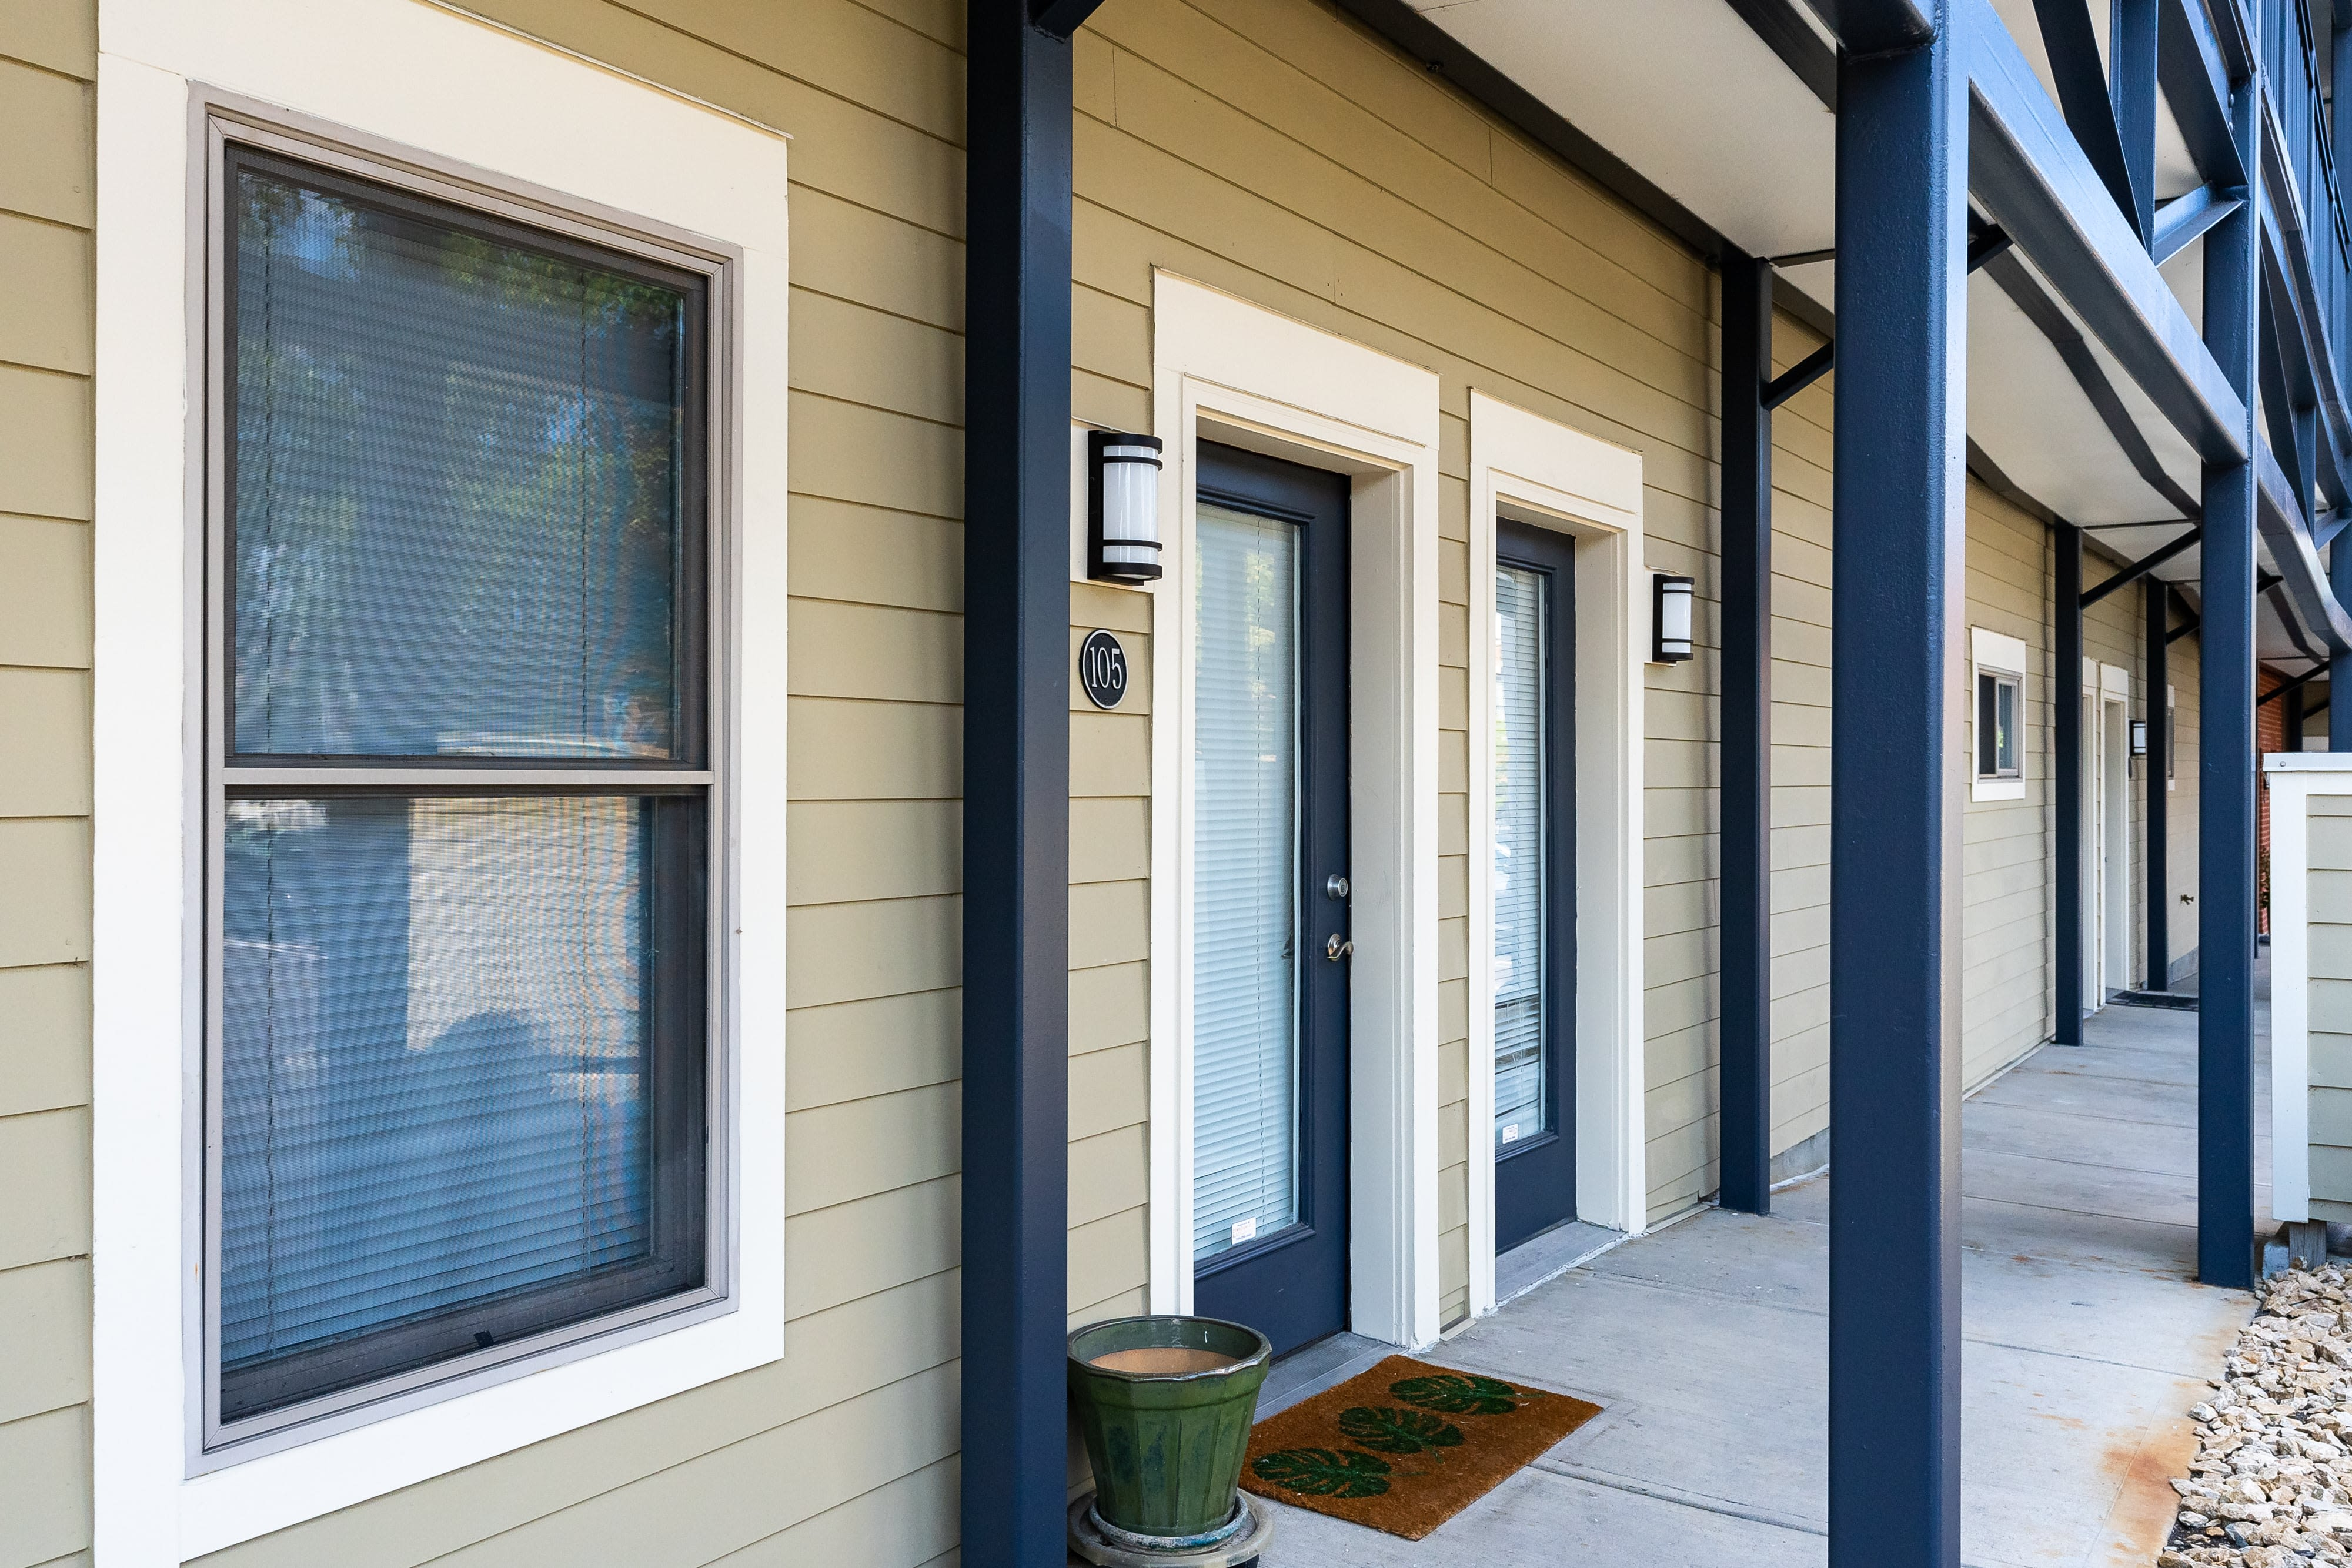 Apartment front doors at Seminary Square Lofts in Covington, Kentucky